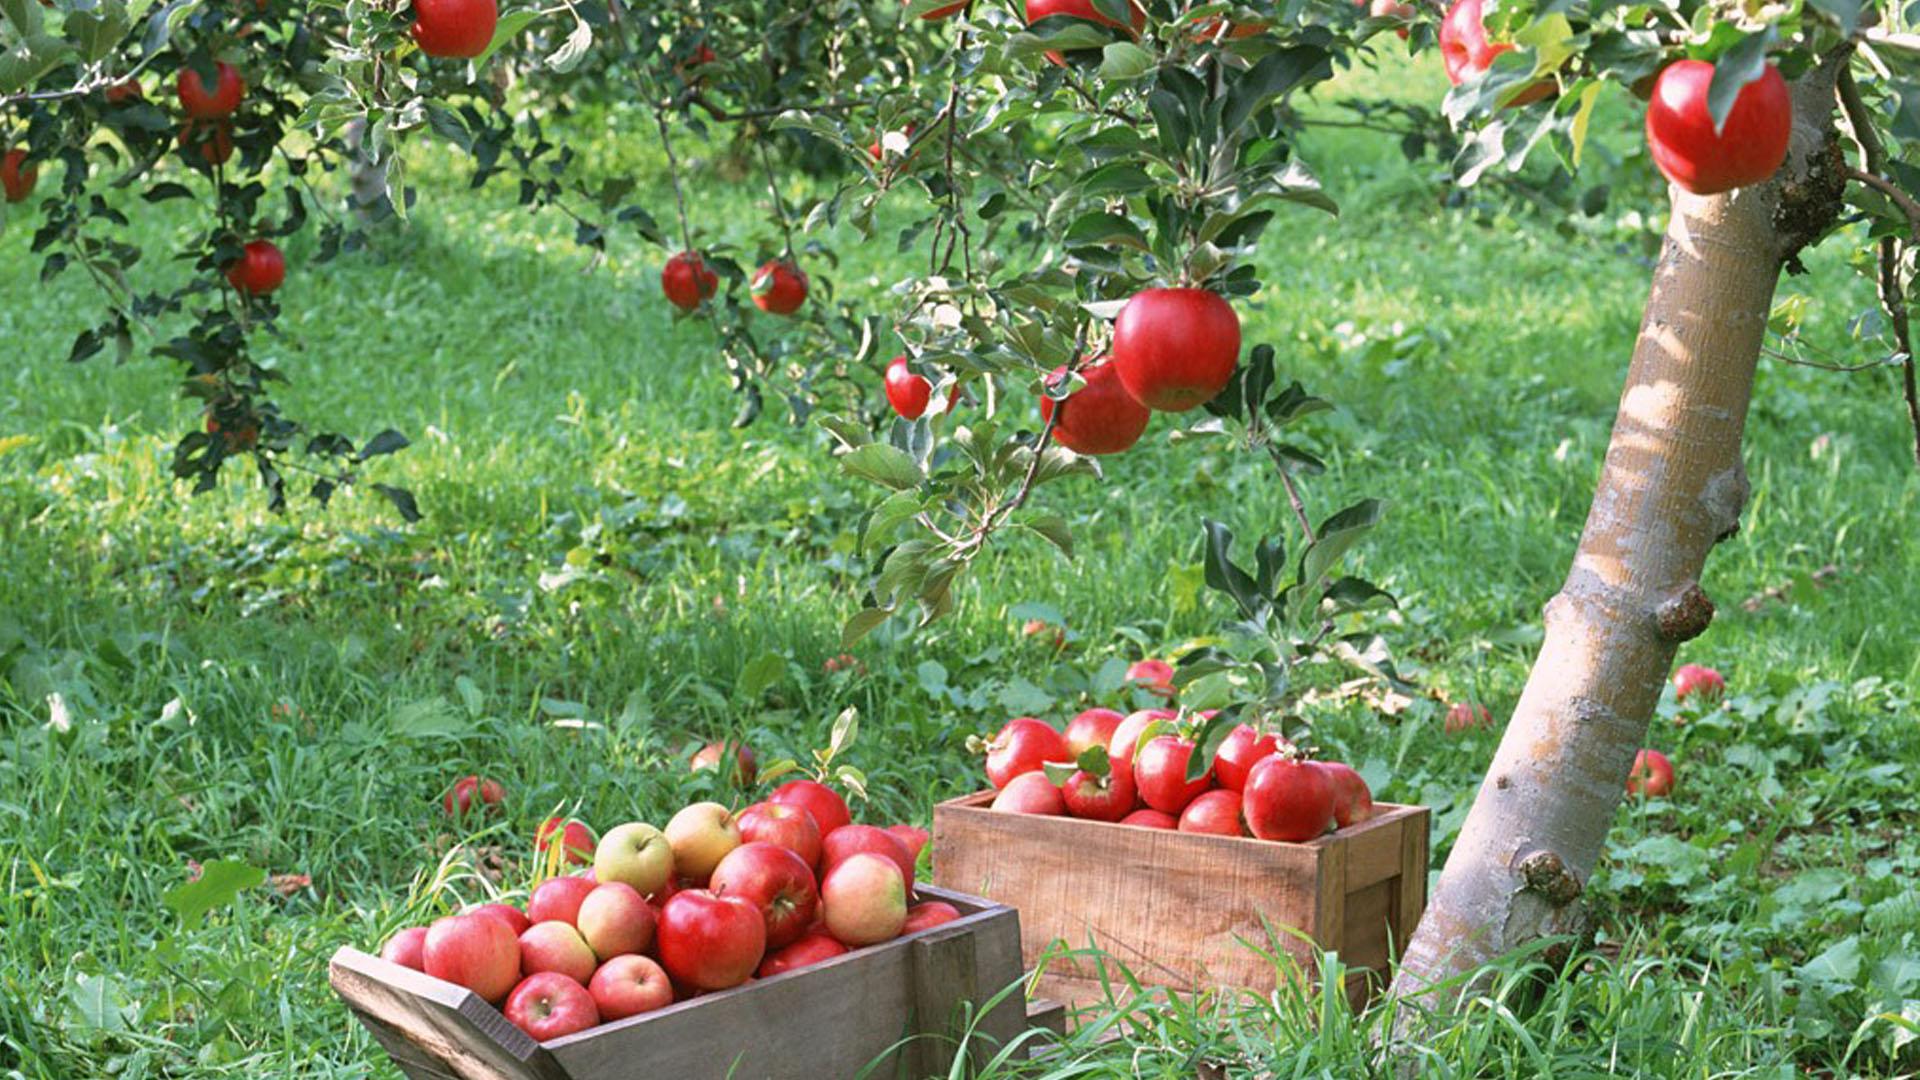 Free Download Apple Tree Wallpaper 842435 1920x1080 For Your Desktop Mobile Tablet Explore 72 Apple Tree Wallpaper Apples Wallpaper Apple Bloom Wallpaper Apple Fruit Wallpaper